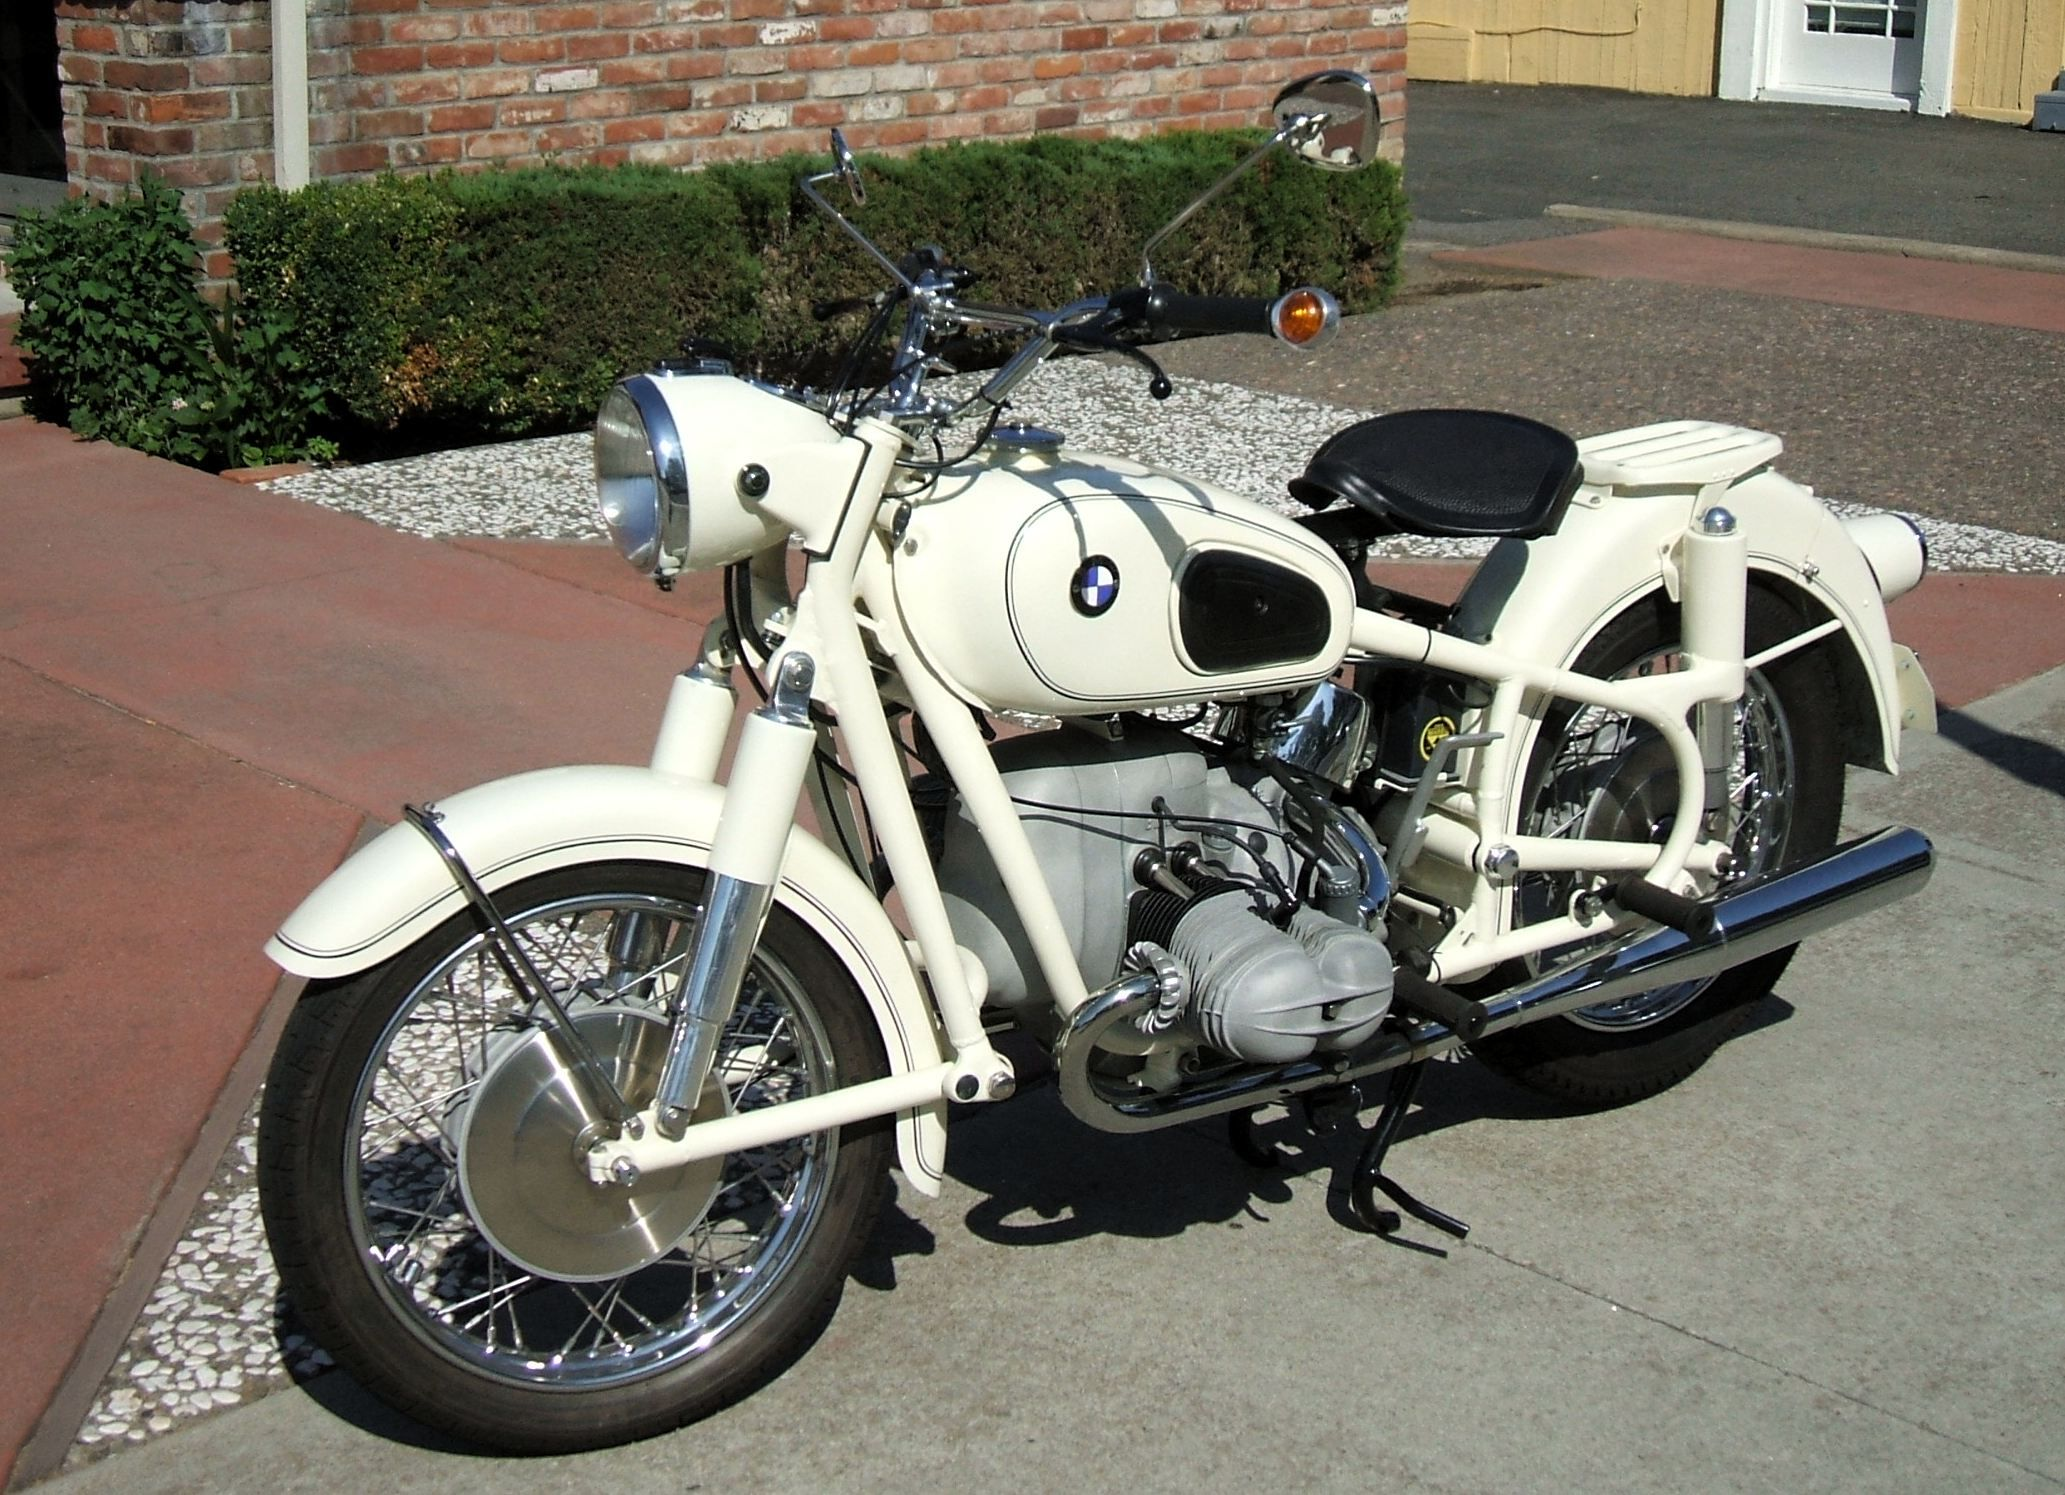 vintage bmw motorcycle | BMW Motorcycle | Auto y motos | Pinterest ...